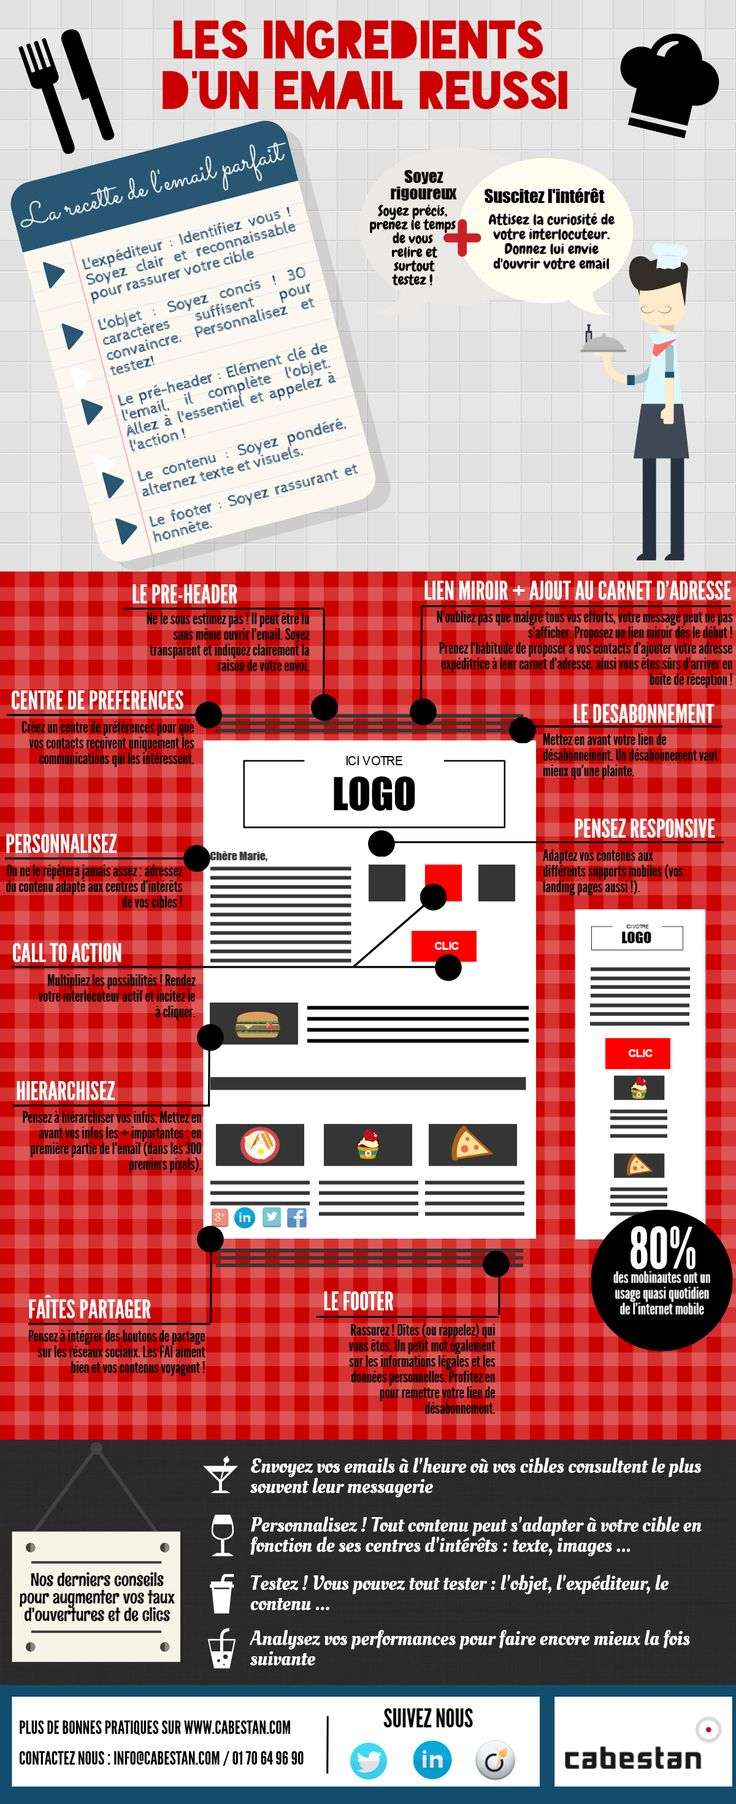 http://www2.cabestan.com/media/Cabestan/2015/Infographie_ingredients_email_juin2015.png #emailing